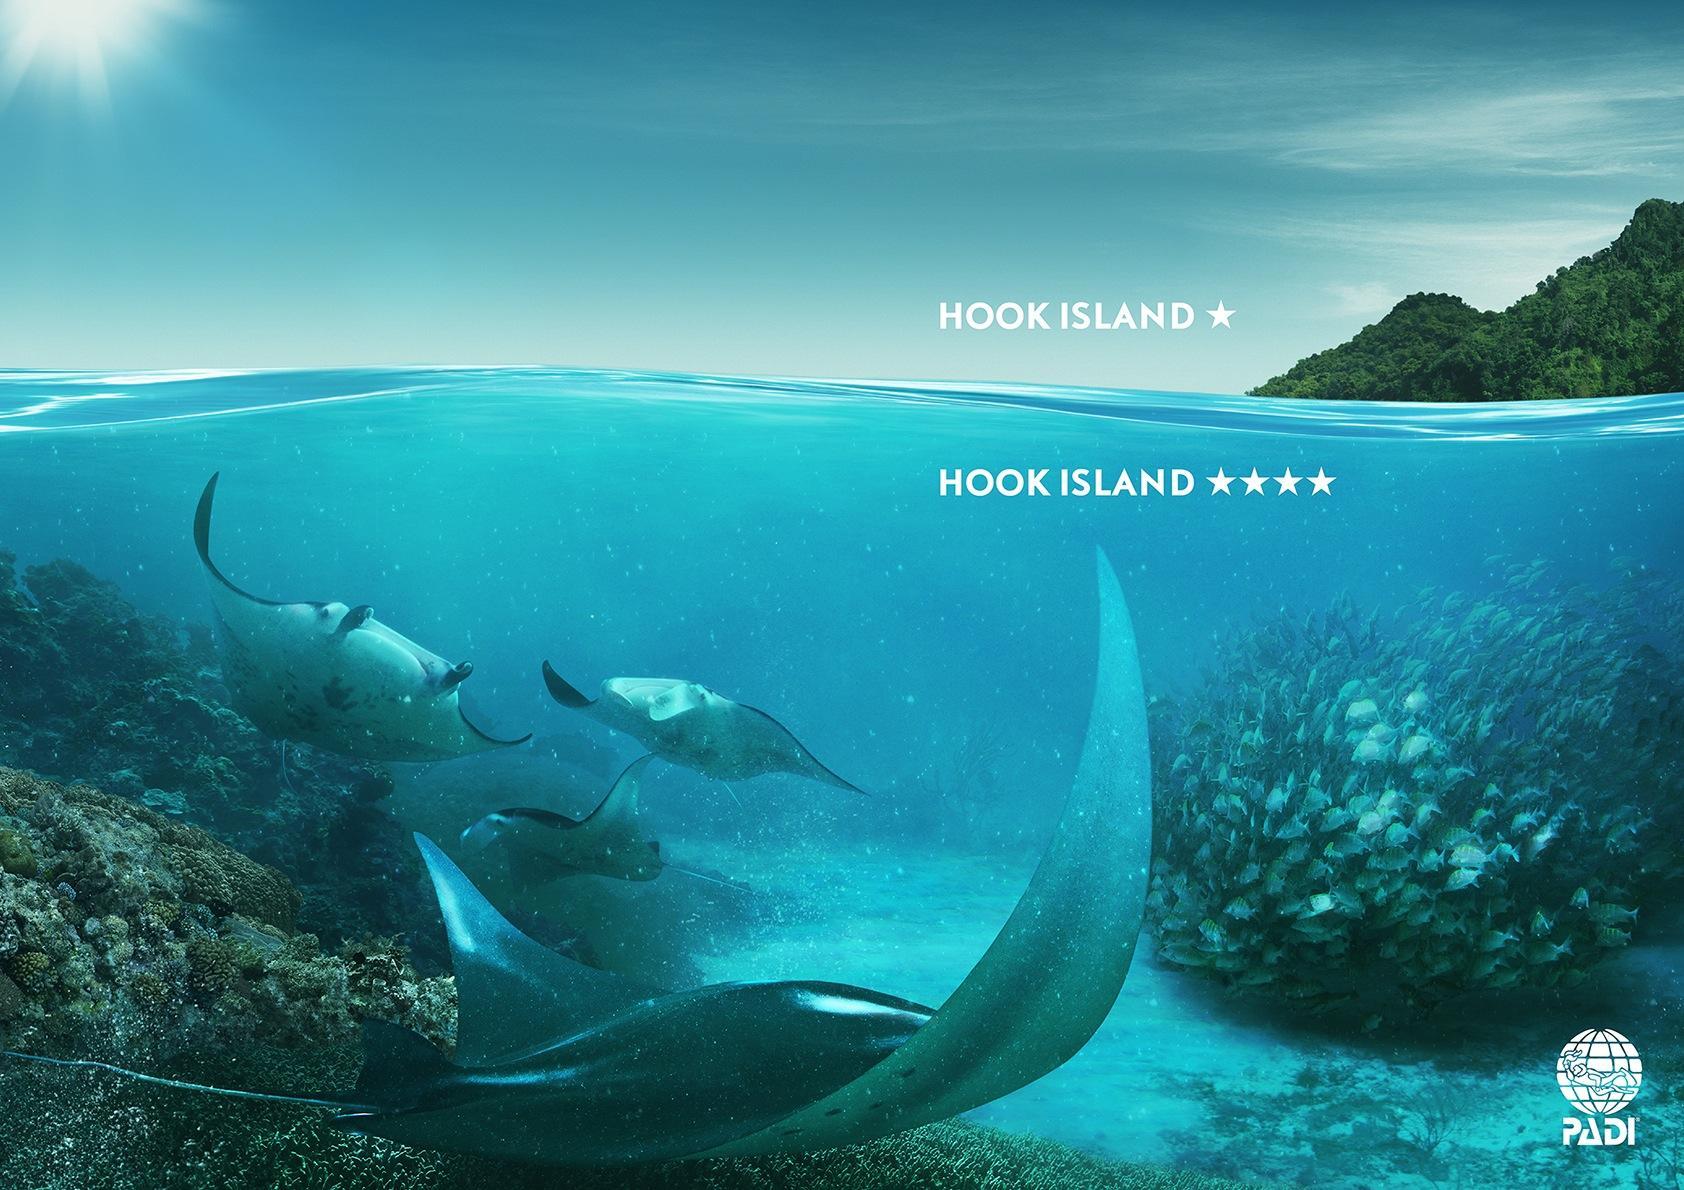 PADI Print Ad -  Hook Island